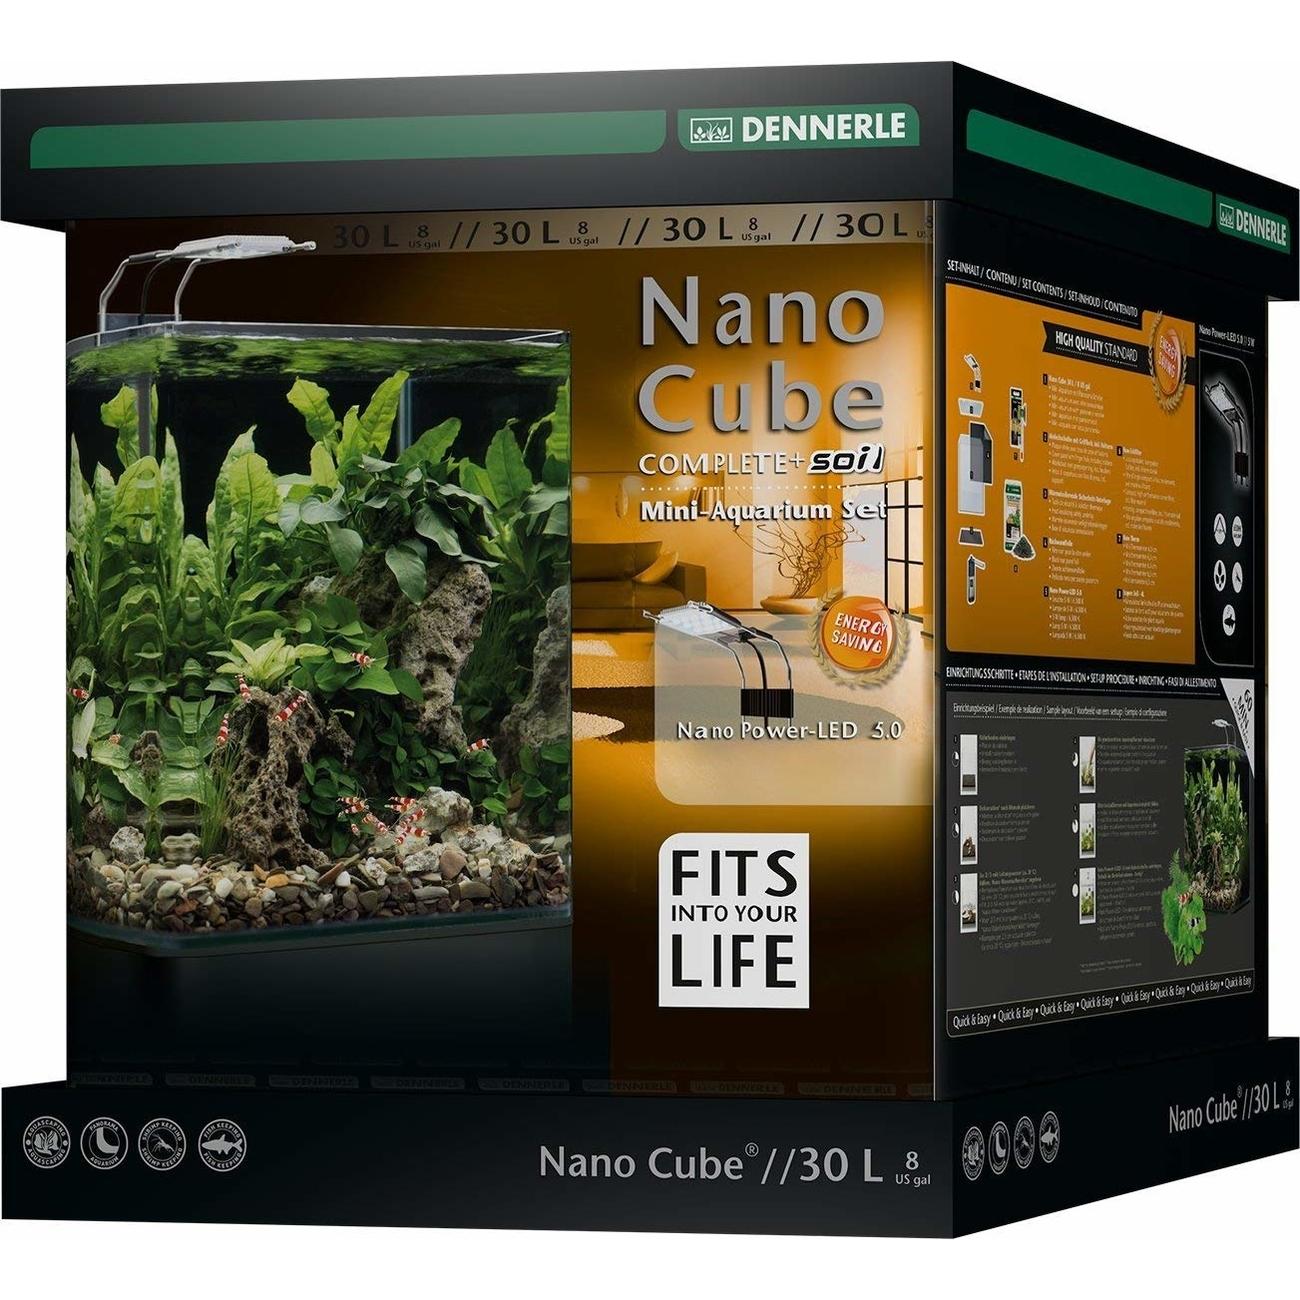 Dennerle NanoCube Complete+ SOIL PowerLED 5.0 Bild 7